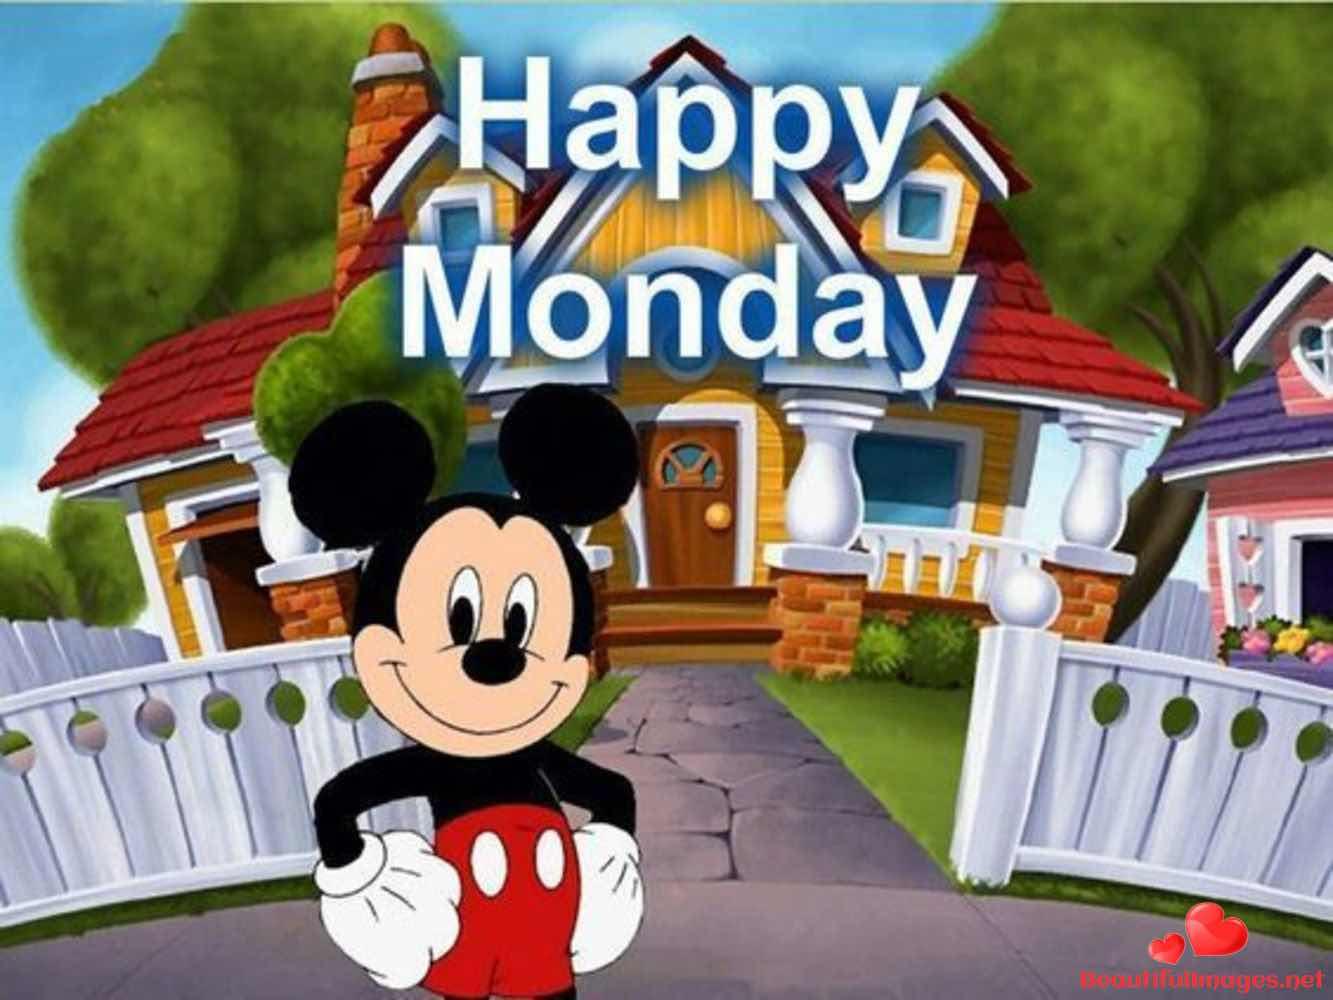 Good-Morning-Monday-Whatsapp-Images-438